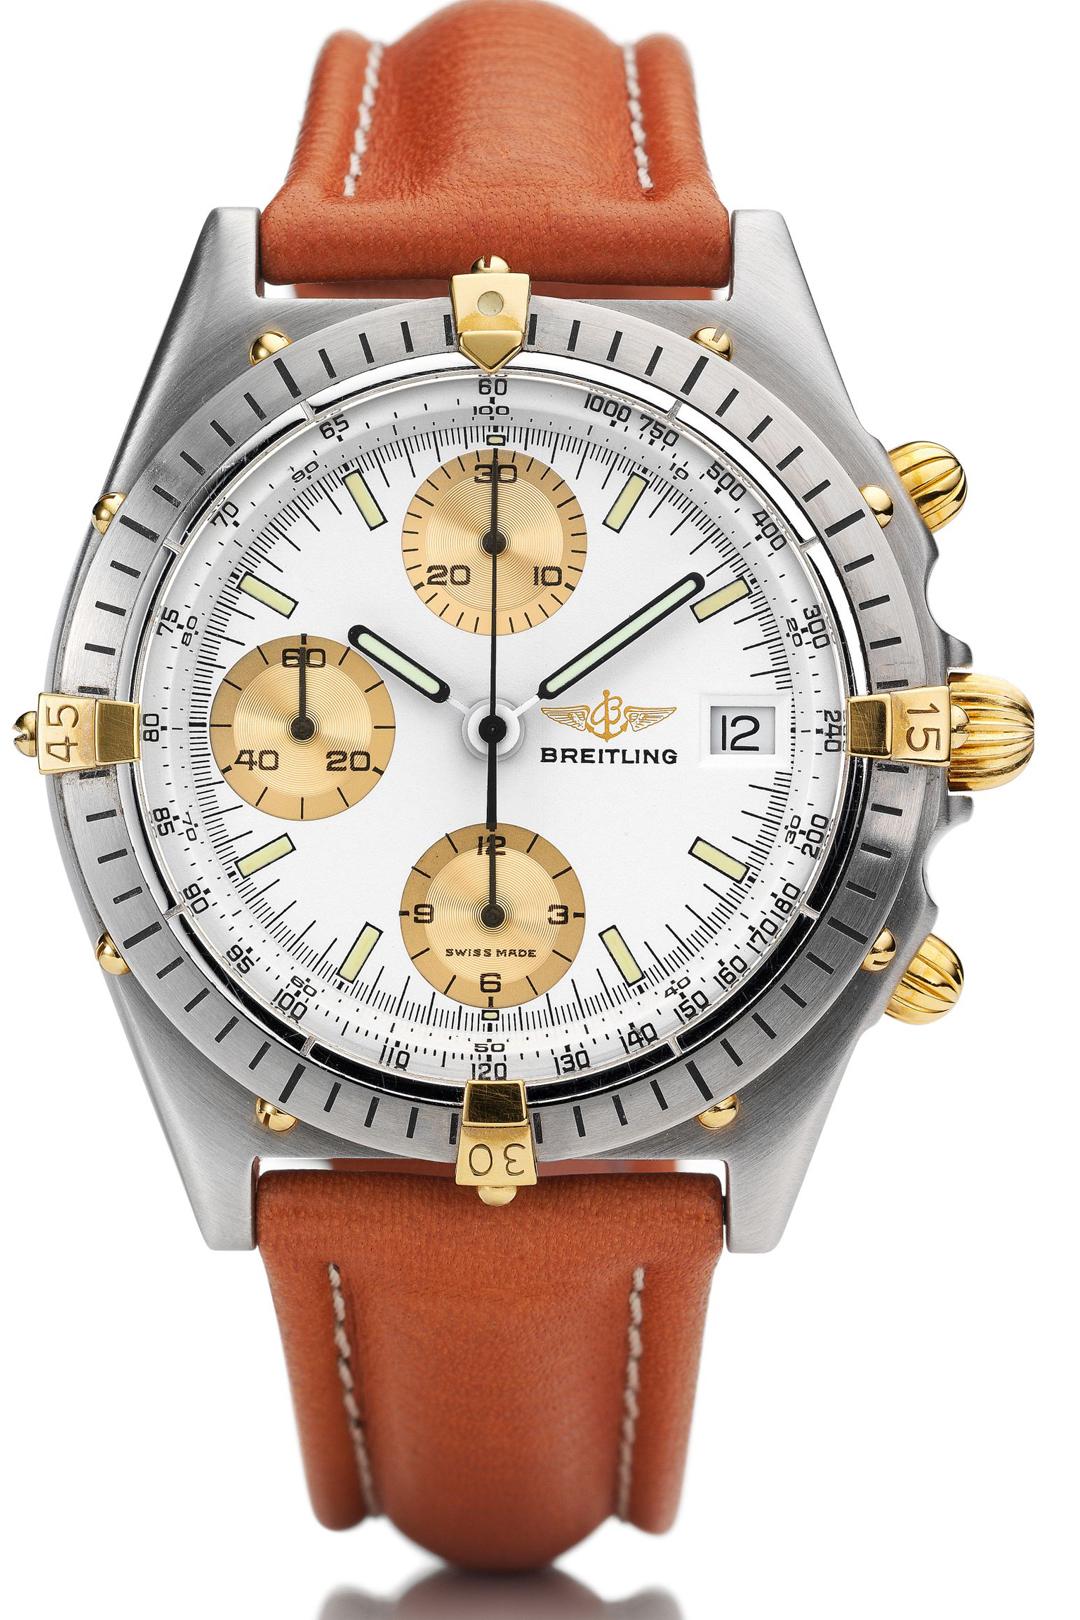 Breitling Chronograph